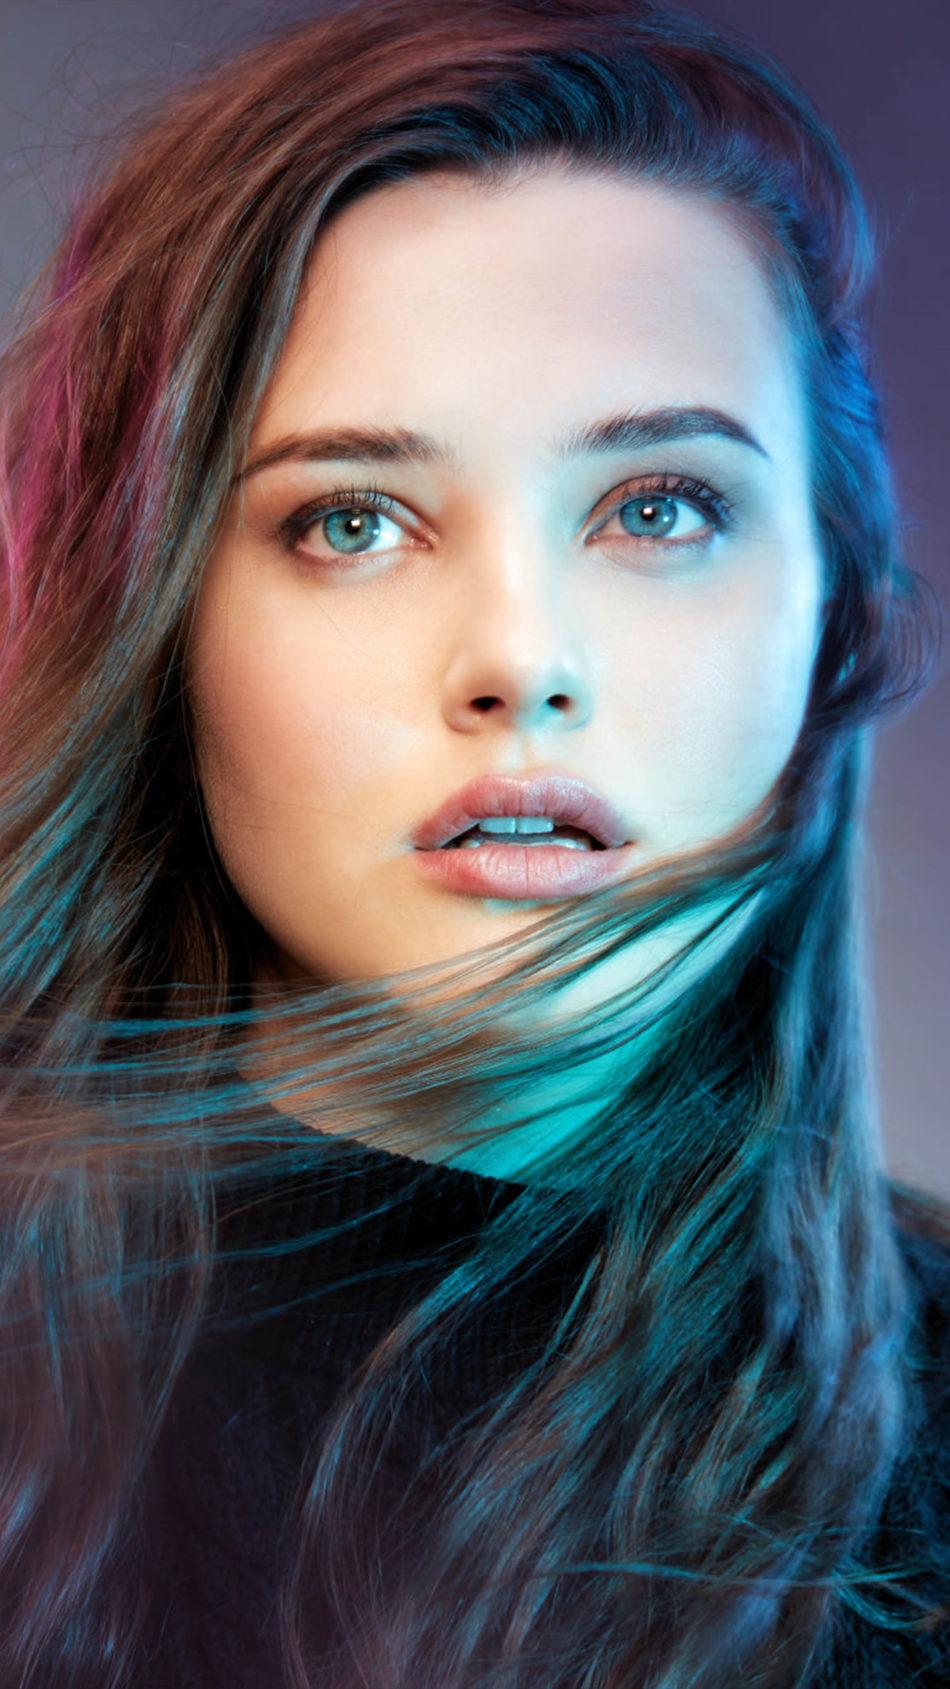 Katherine Langford Neon Lights 4K Ultra HD Mobile Wallpaper